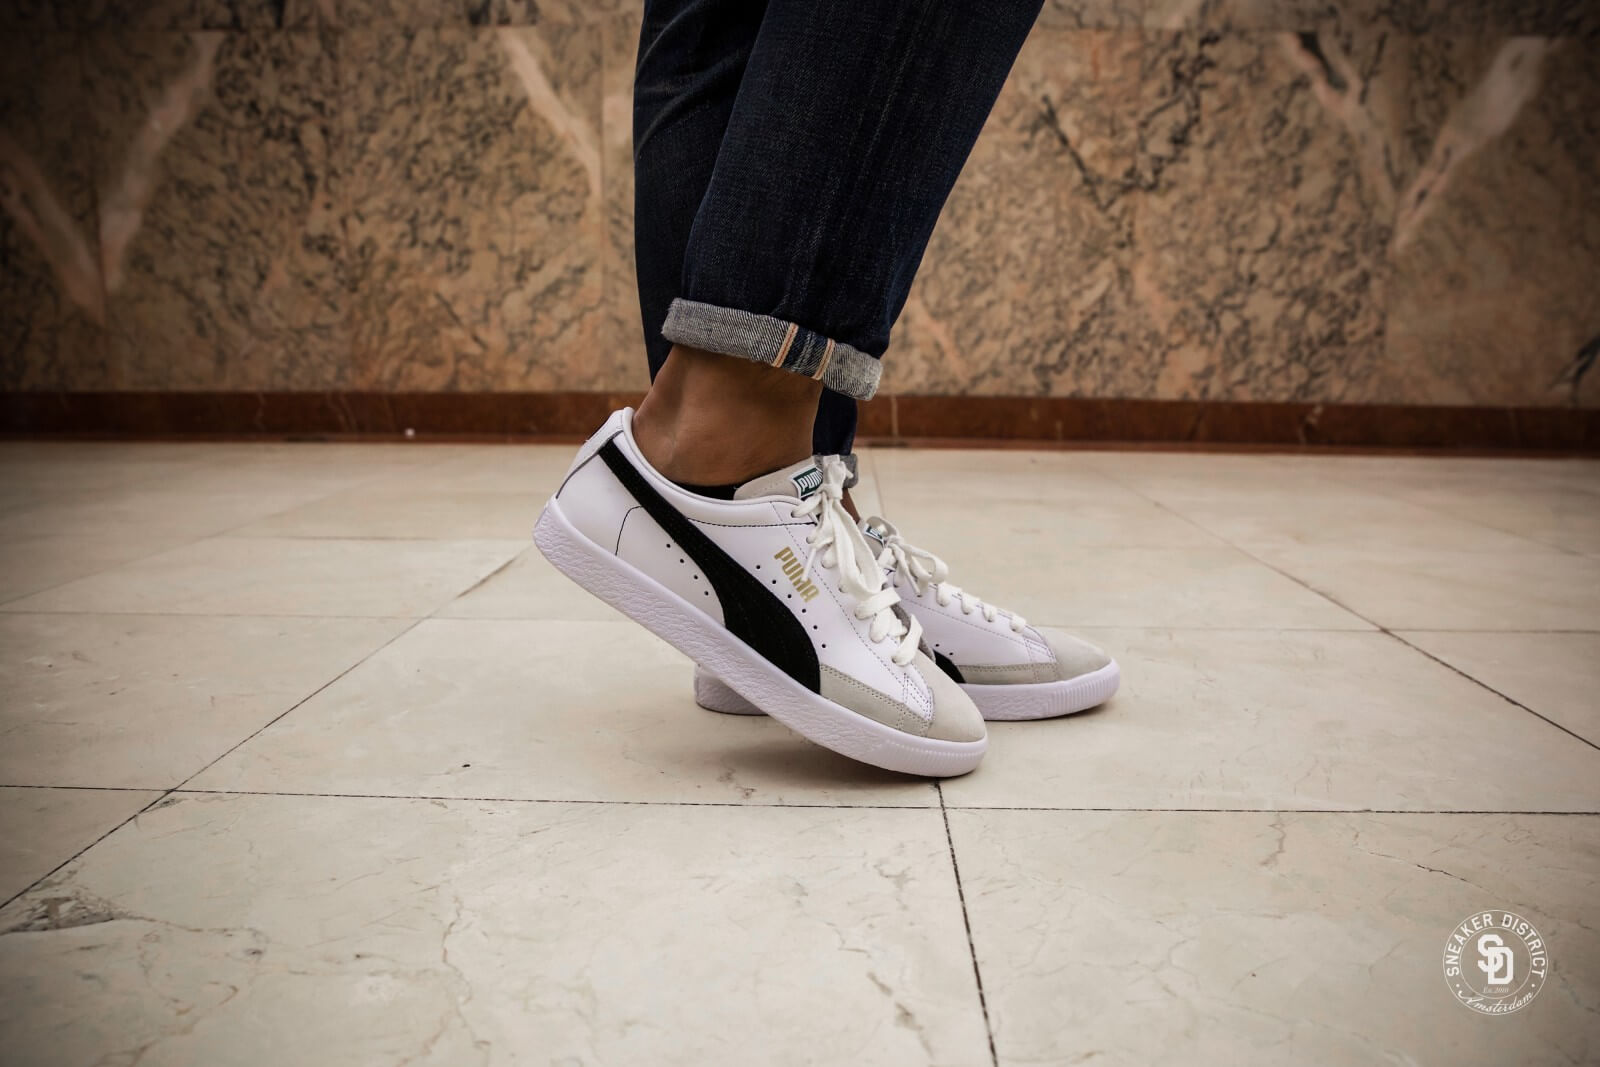 Puma Basket 90680 puma black puma white: : Schuhe